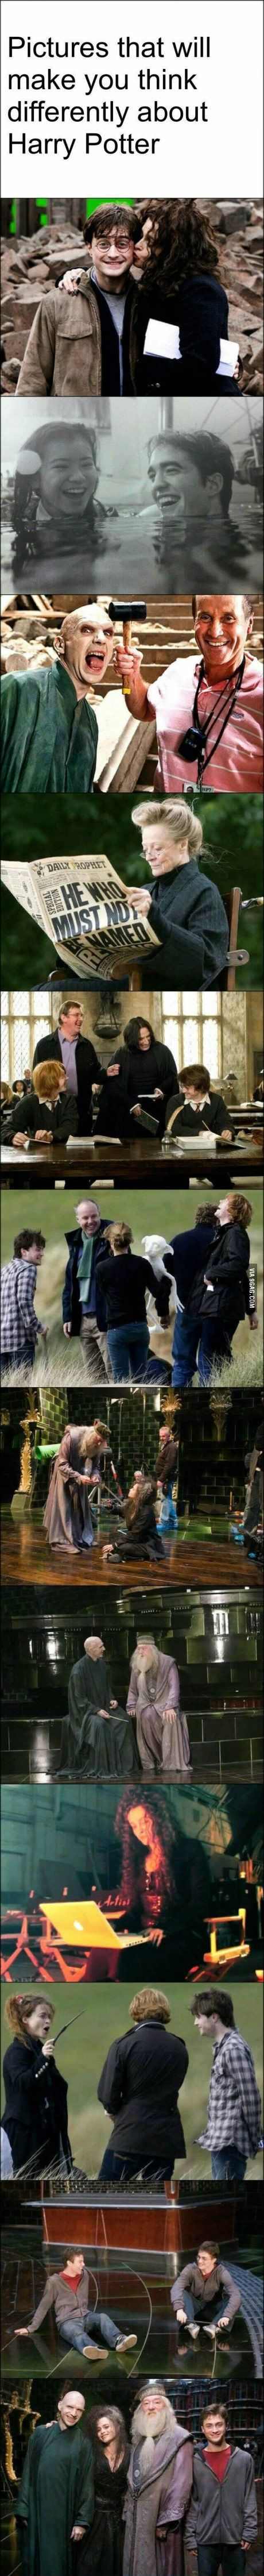 Rare Harry Potter behind the scene photos.